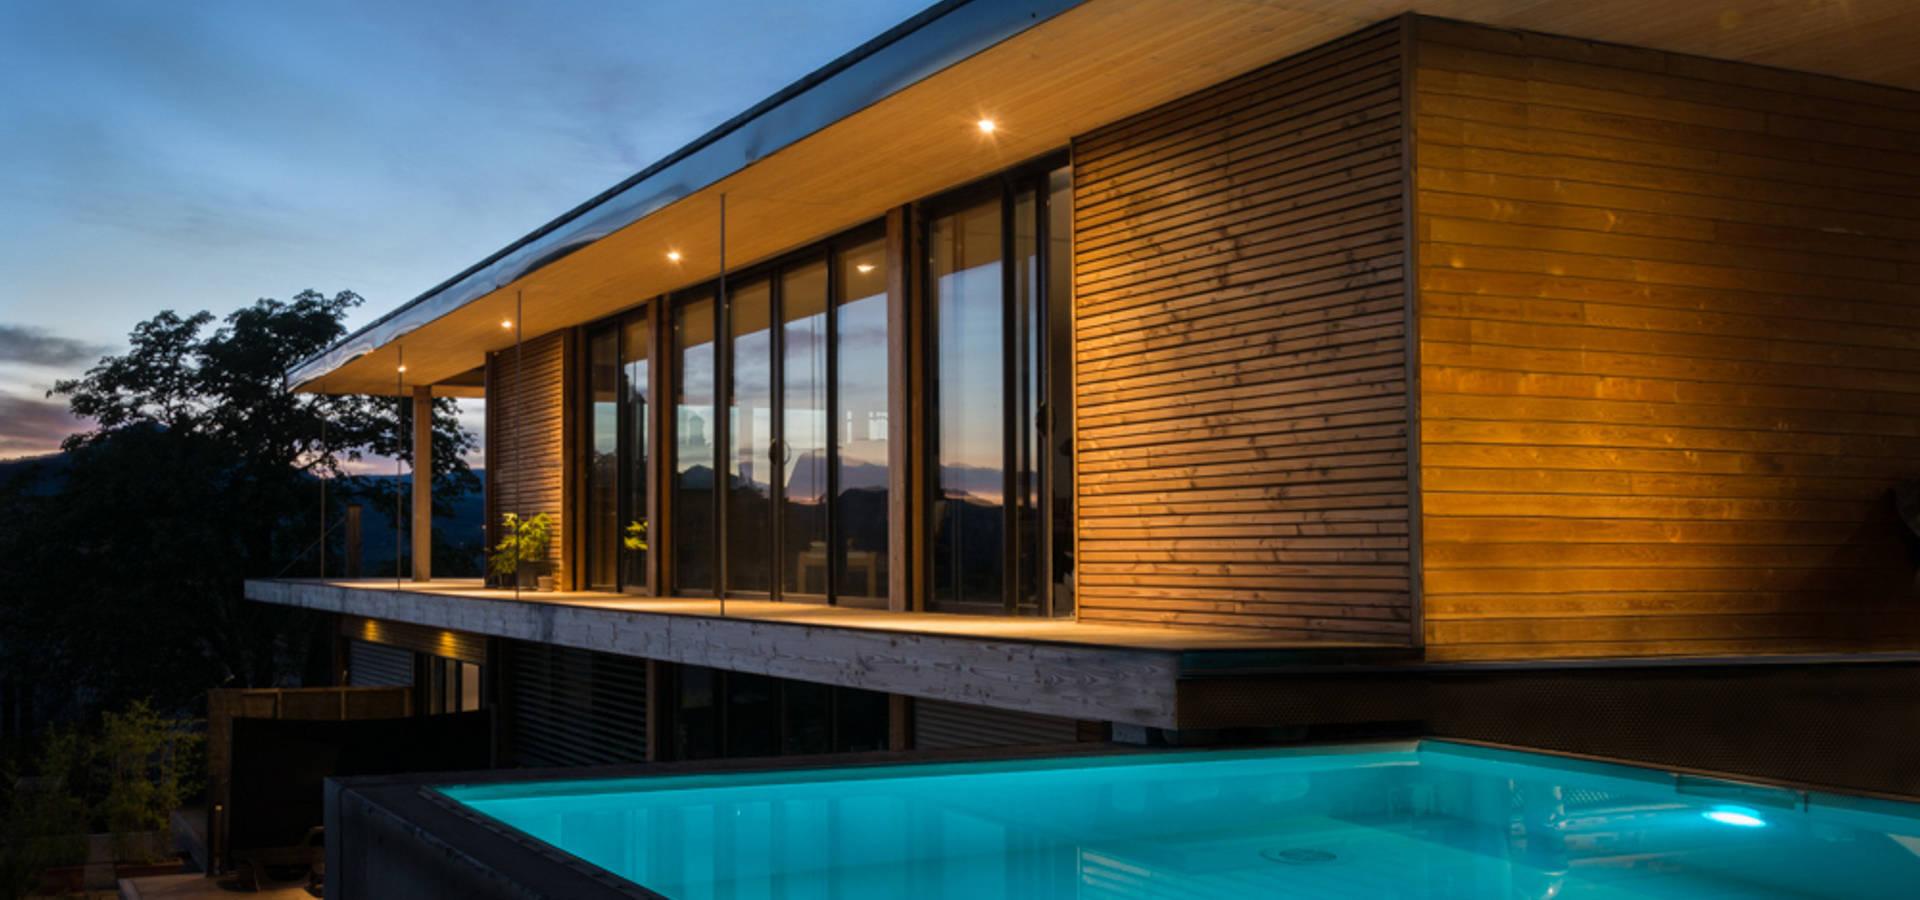 Image De Maison Moderne maison moderne boissarl naturarch | homify